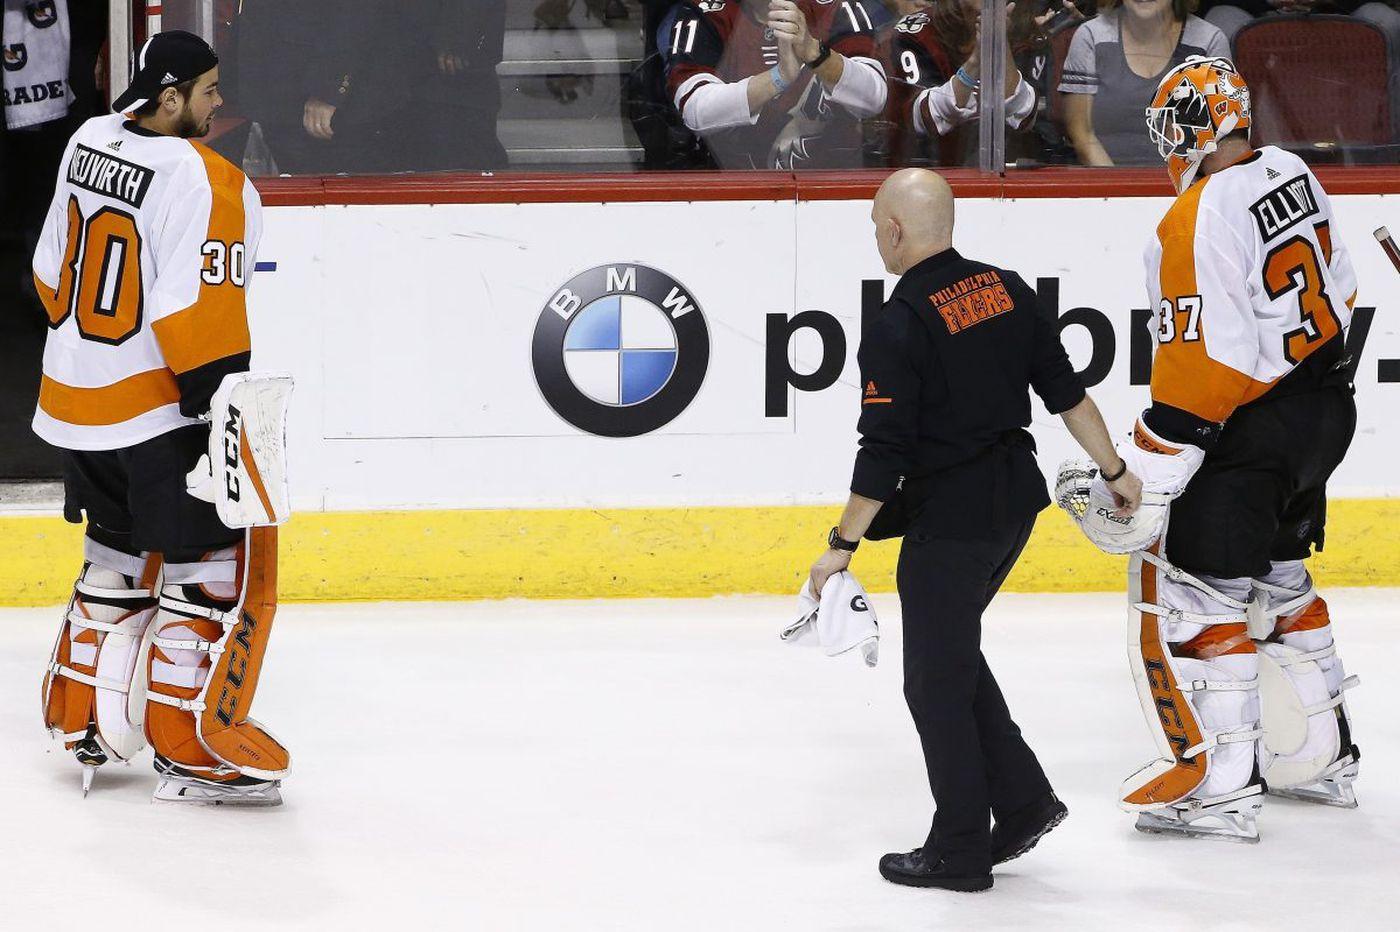 Flyers goalie Brian Elliott has 'core muscle' surgery, team says